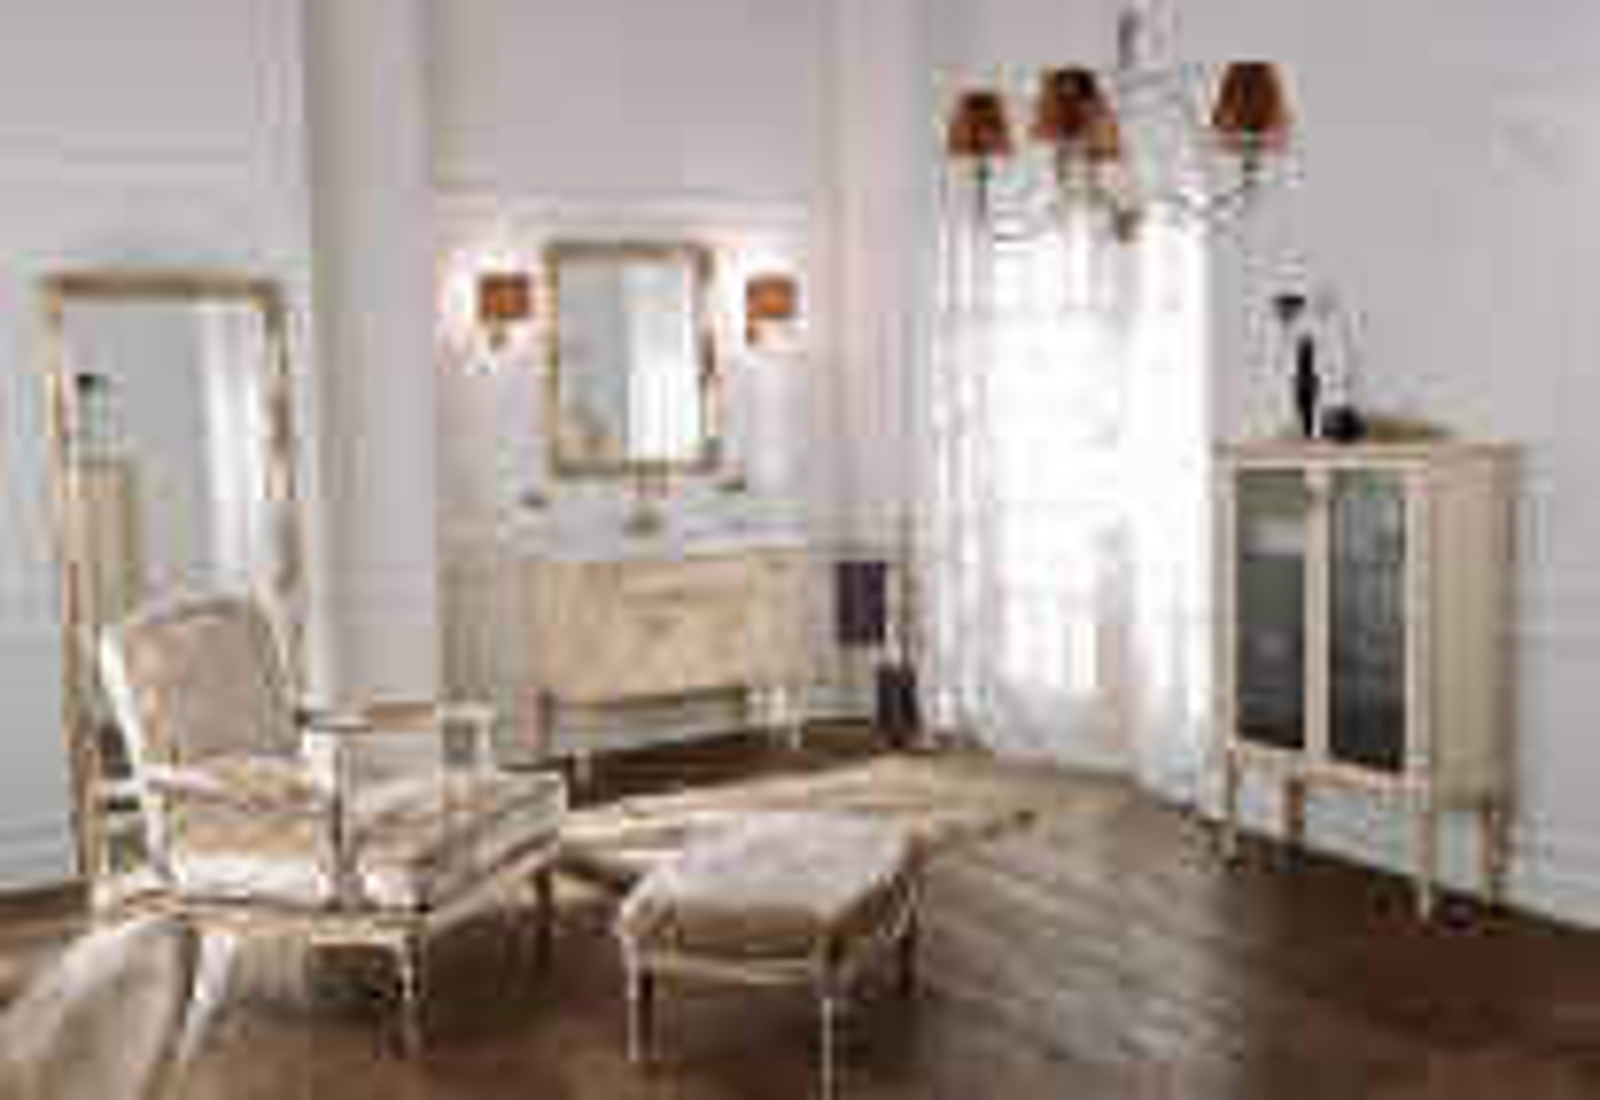 Комплект мебели Labor Legno MILADY Composizione MIL 106, бежевый антиквариат с декором/бронза, 105 см